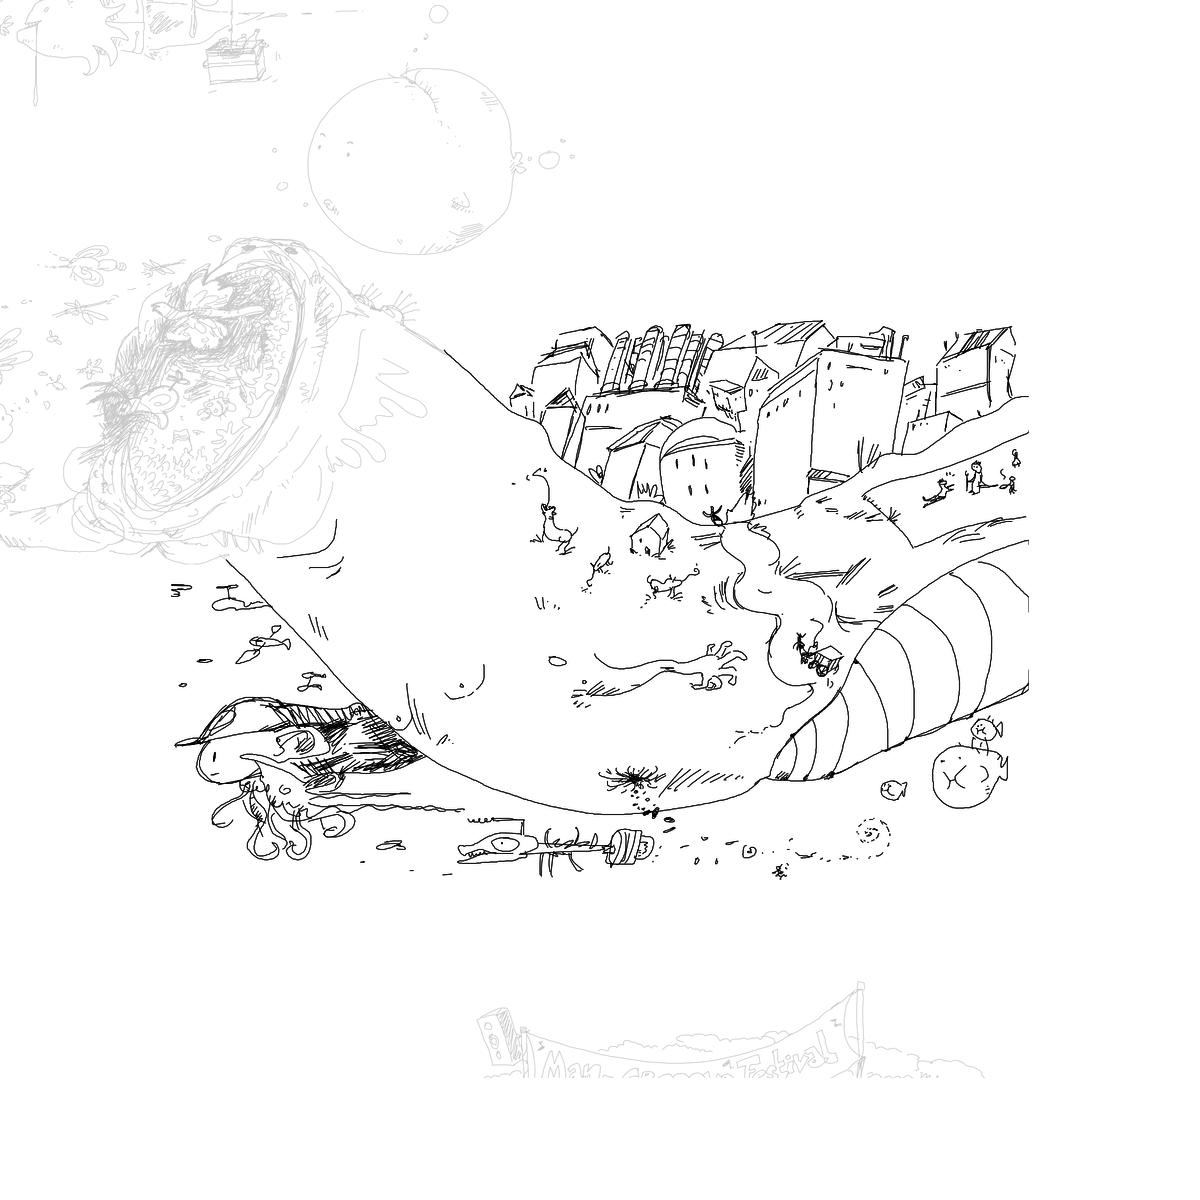 BAAAM drawing#3539 lat:78.4206466674804700lng: -4.4865684509277340